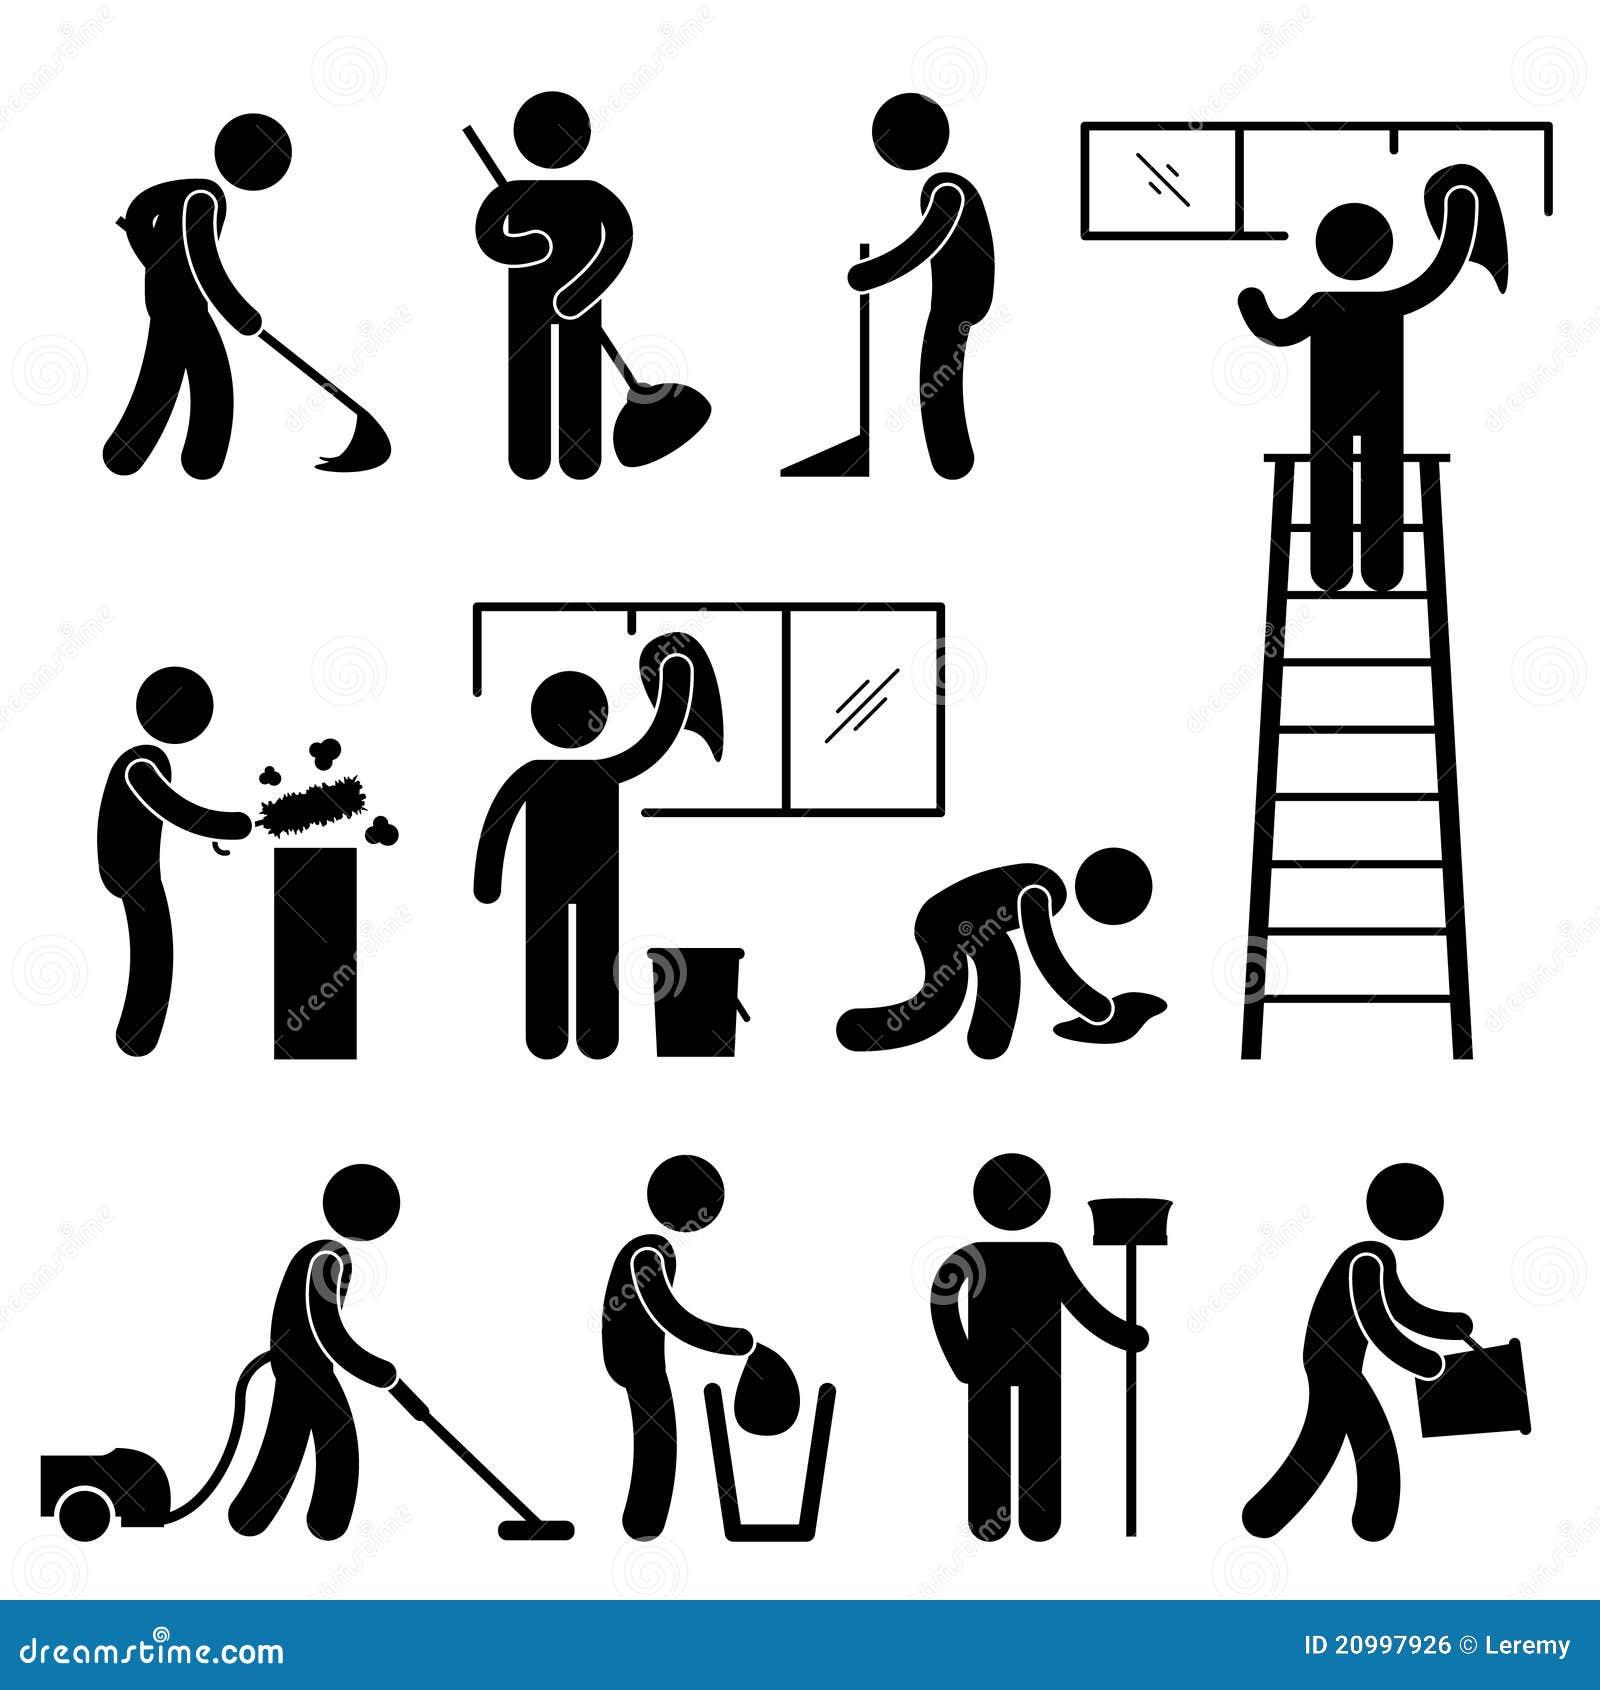 clean wash wipe vacuum cleaner worker pictogram stock. Black Bedroom Furniture Sets. Home Design Ideas